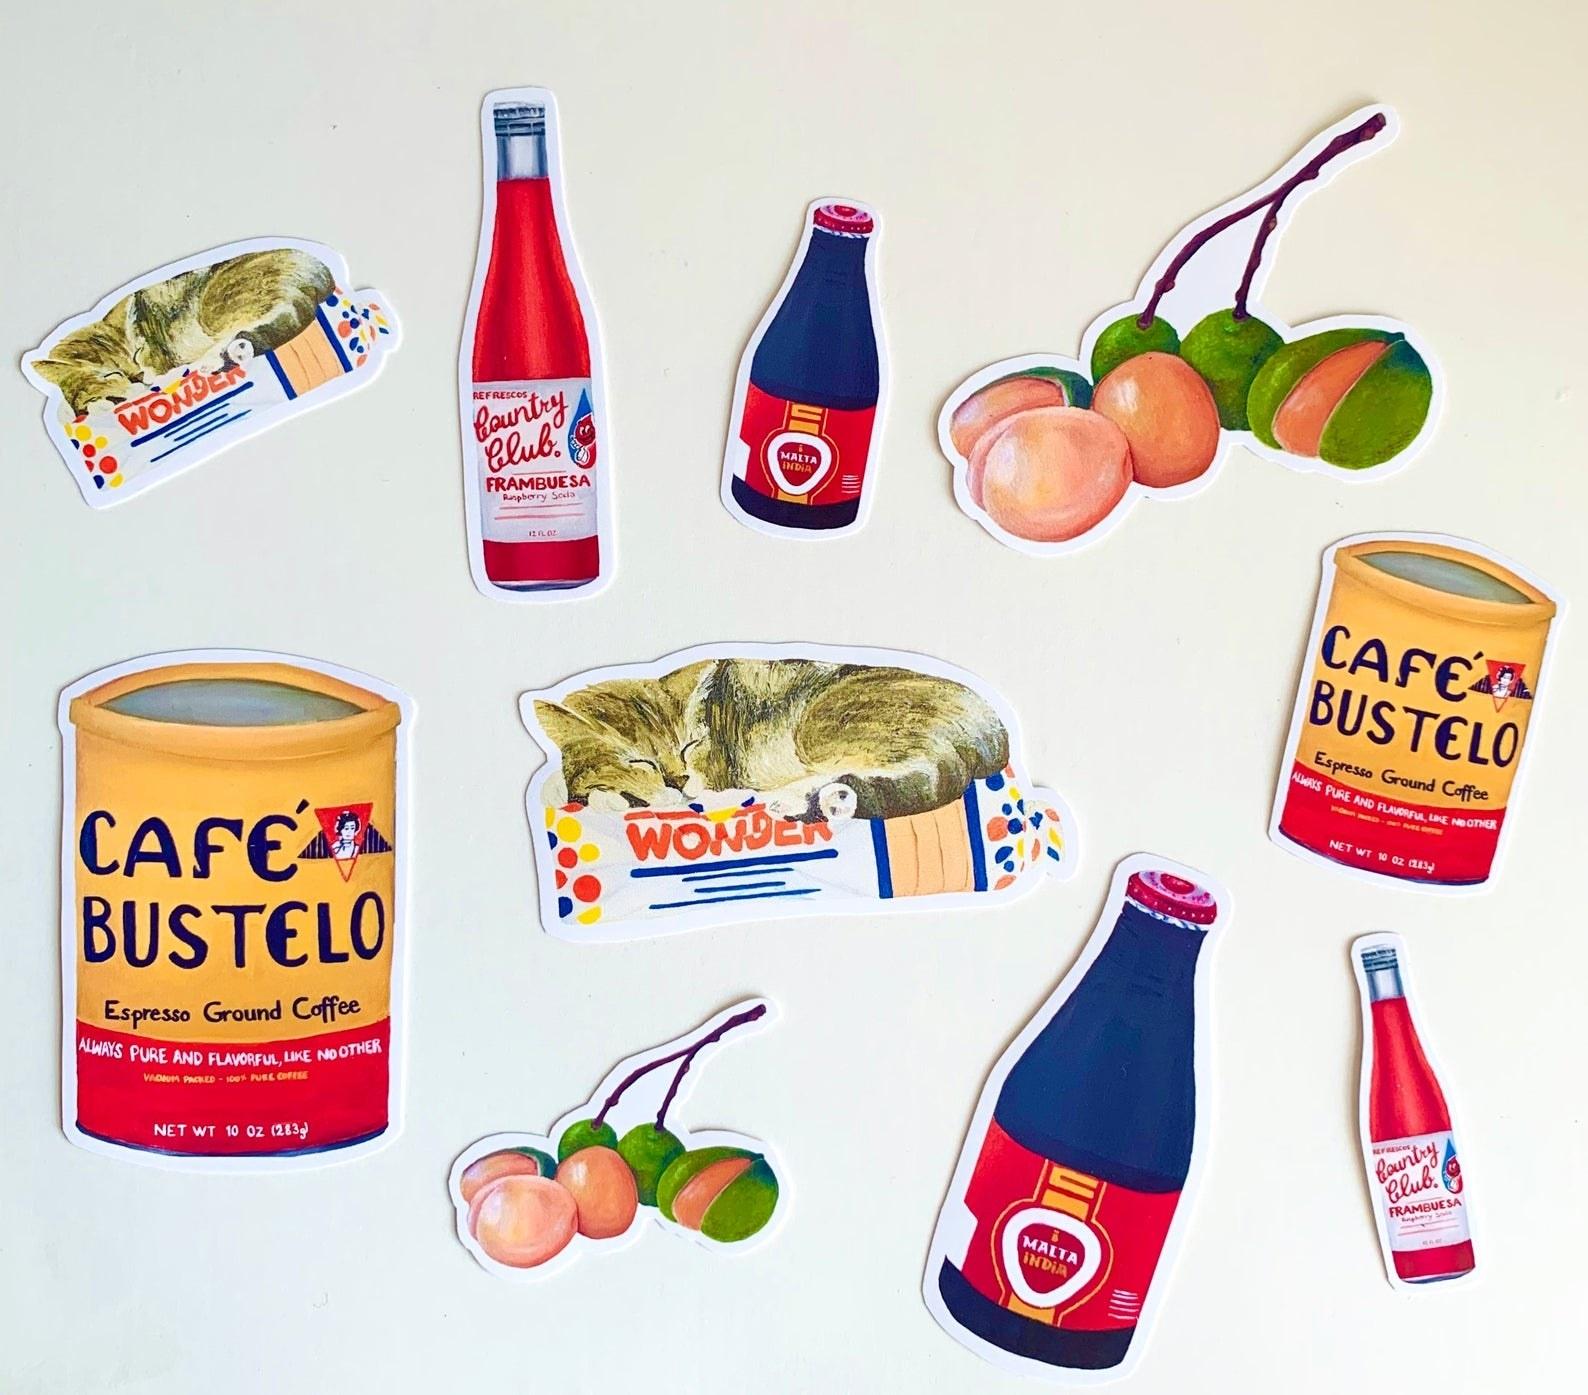 bodega-themed stickers with café bustelo, wonder bread, a bodega cat, quenapas, malta, and country club